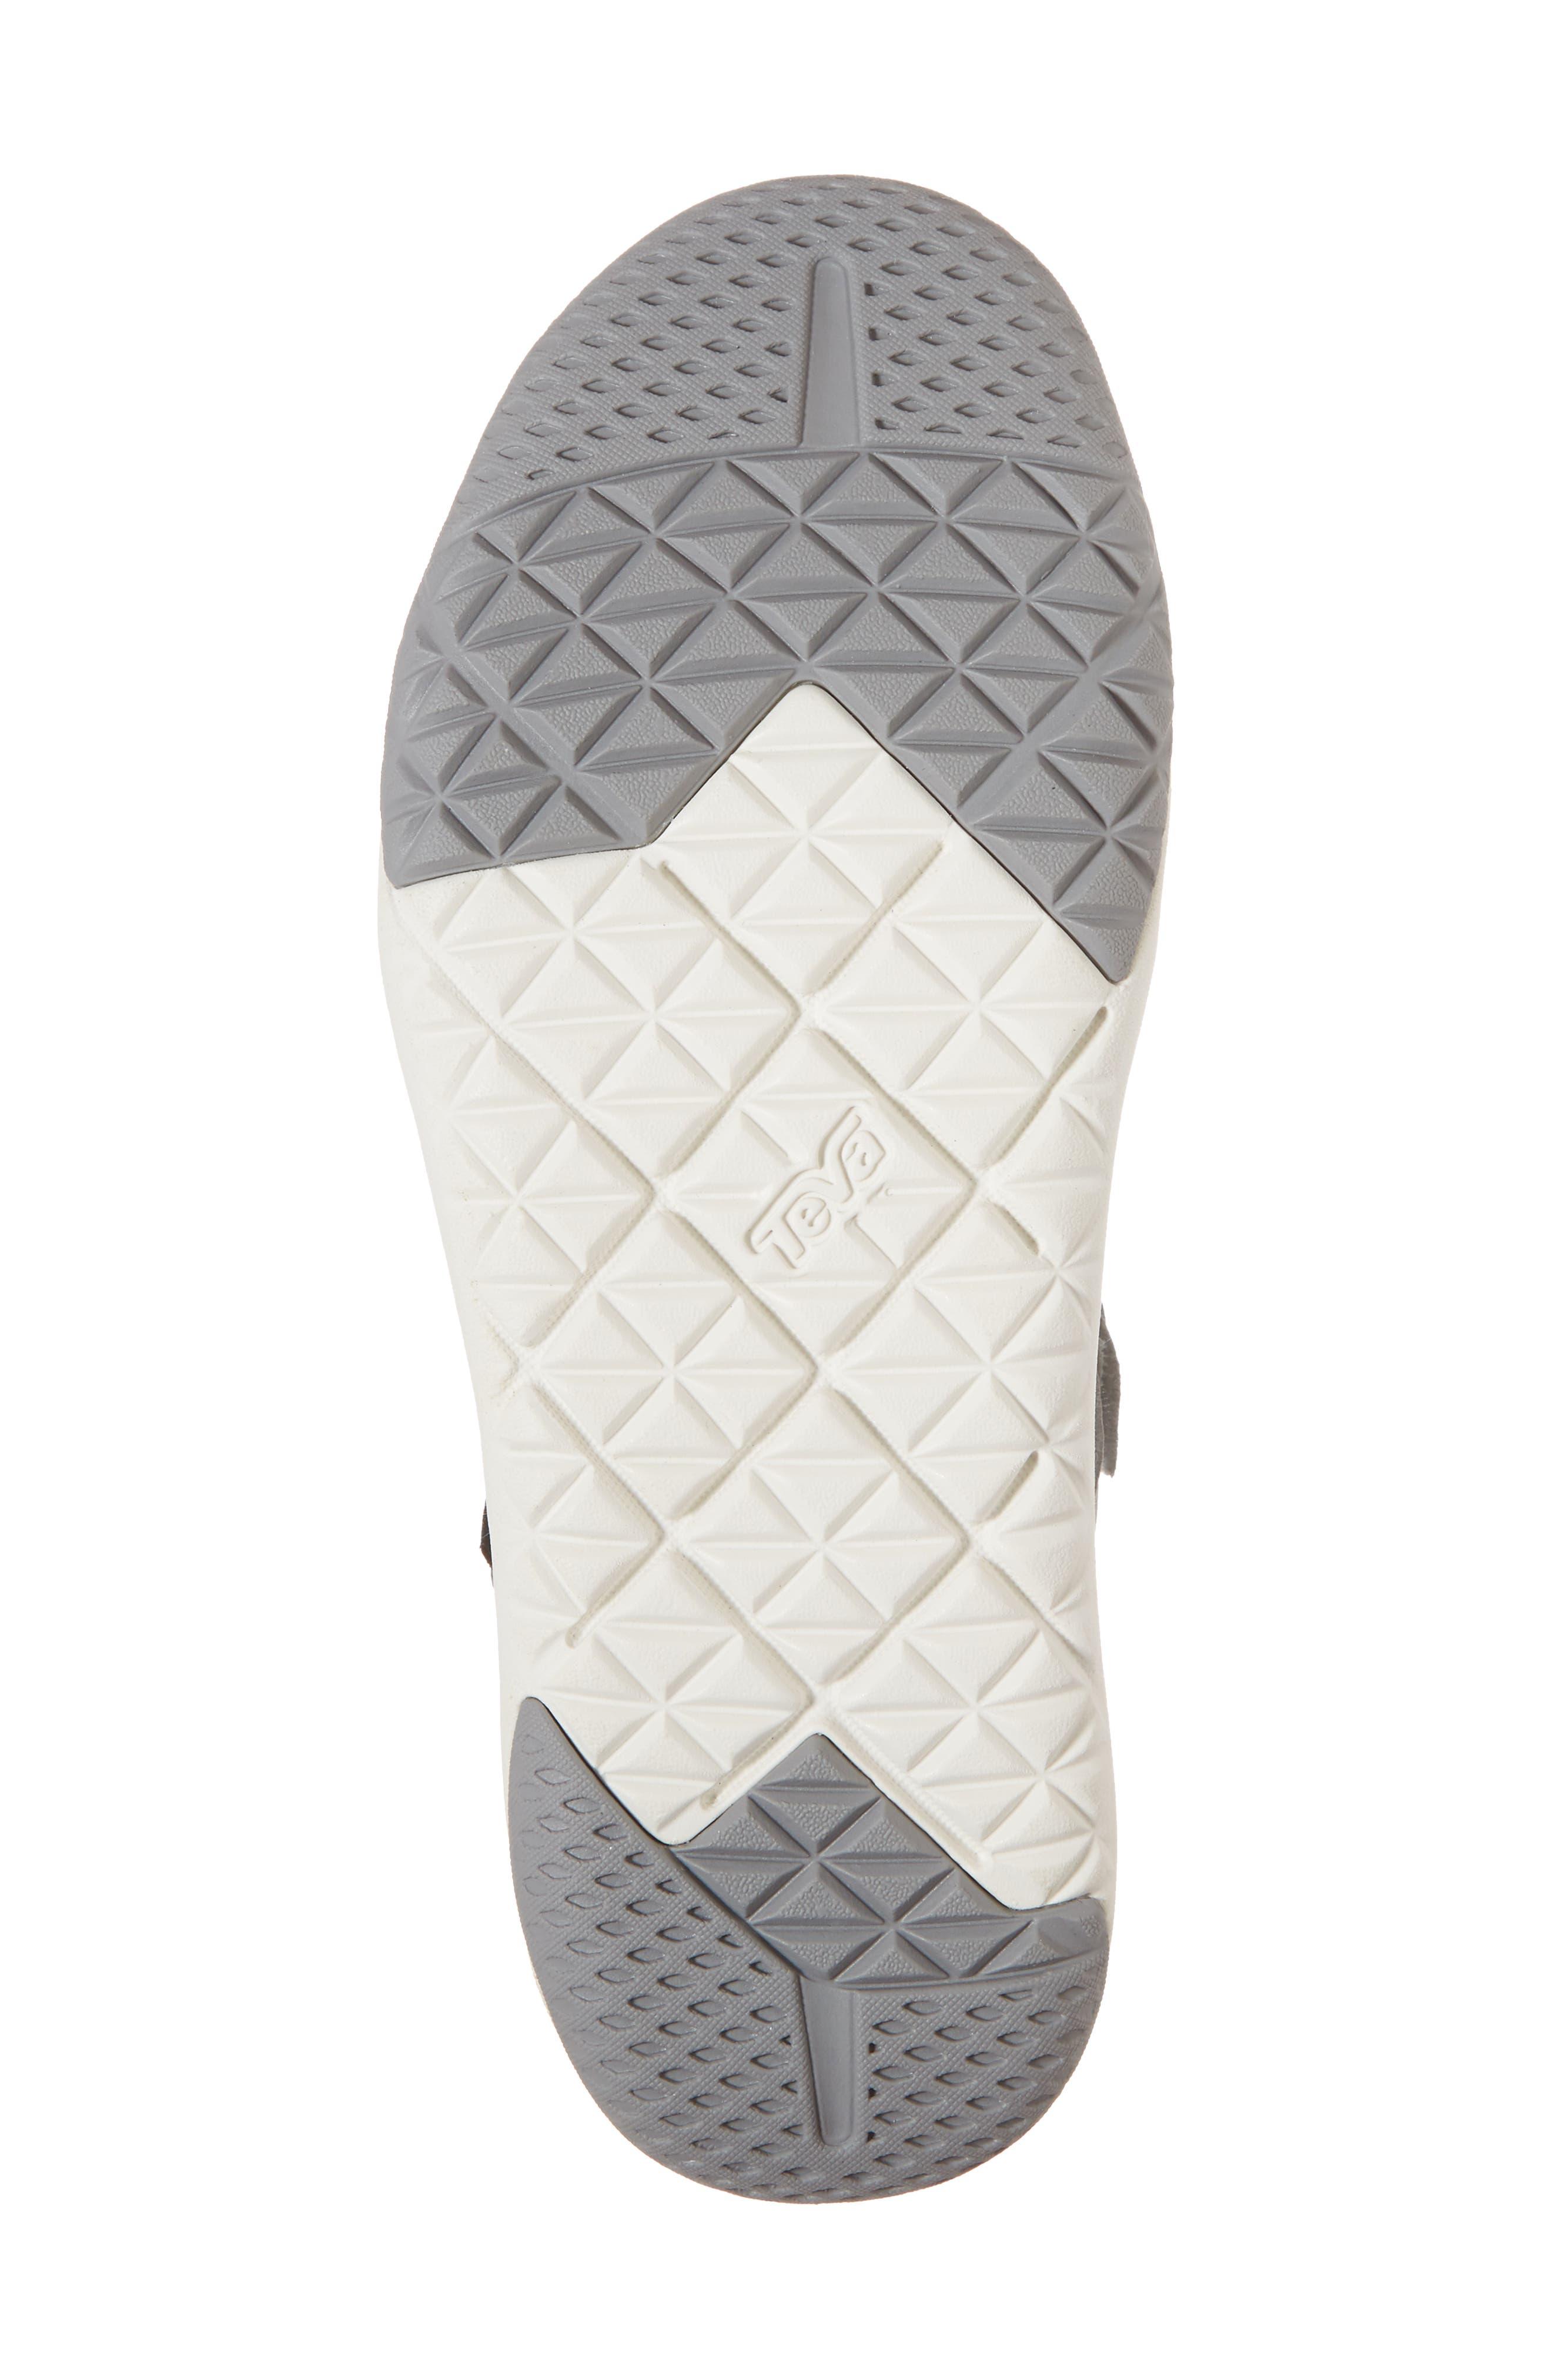 Terra Float Travel Knit Active Sandal,                             Alternate thumbnail 6, color,                             Wild Dove